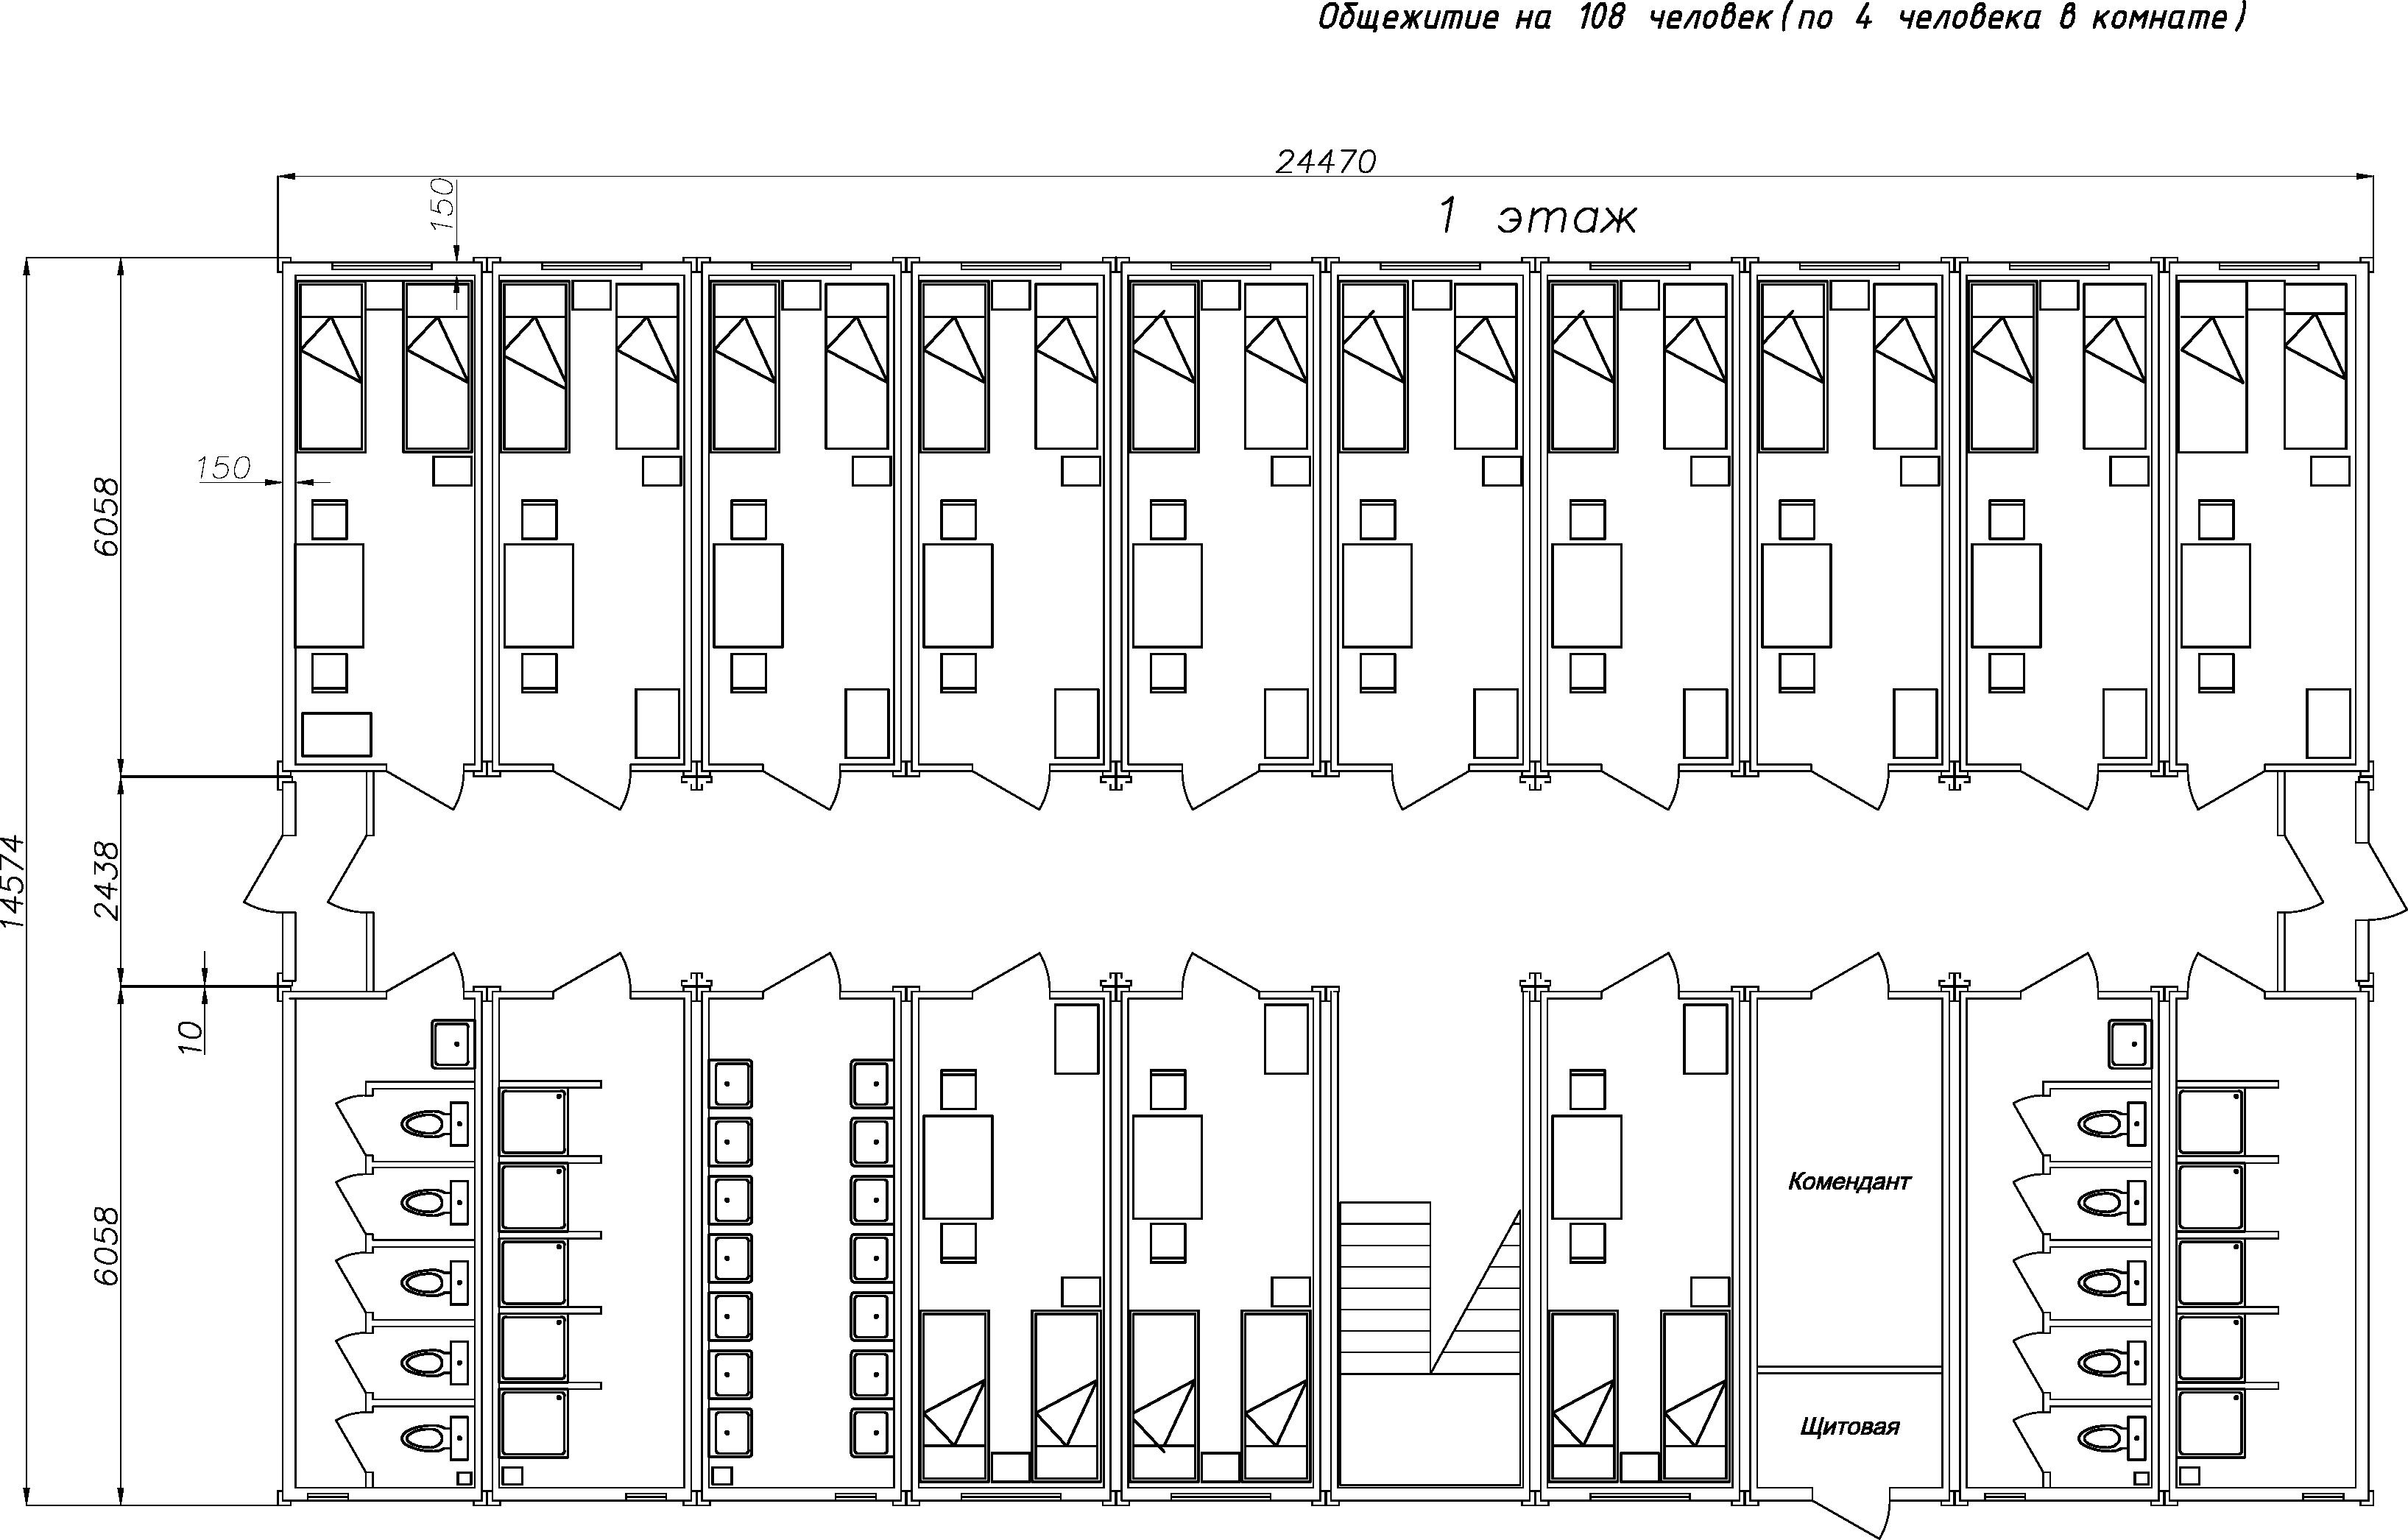 modzdan